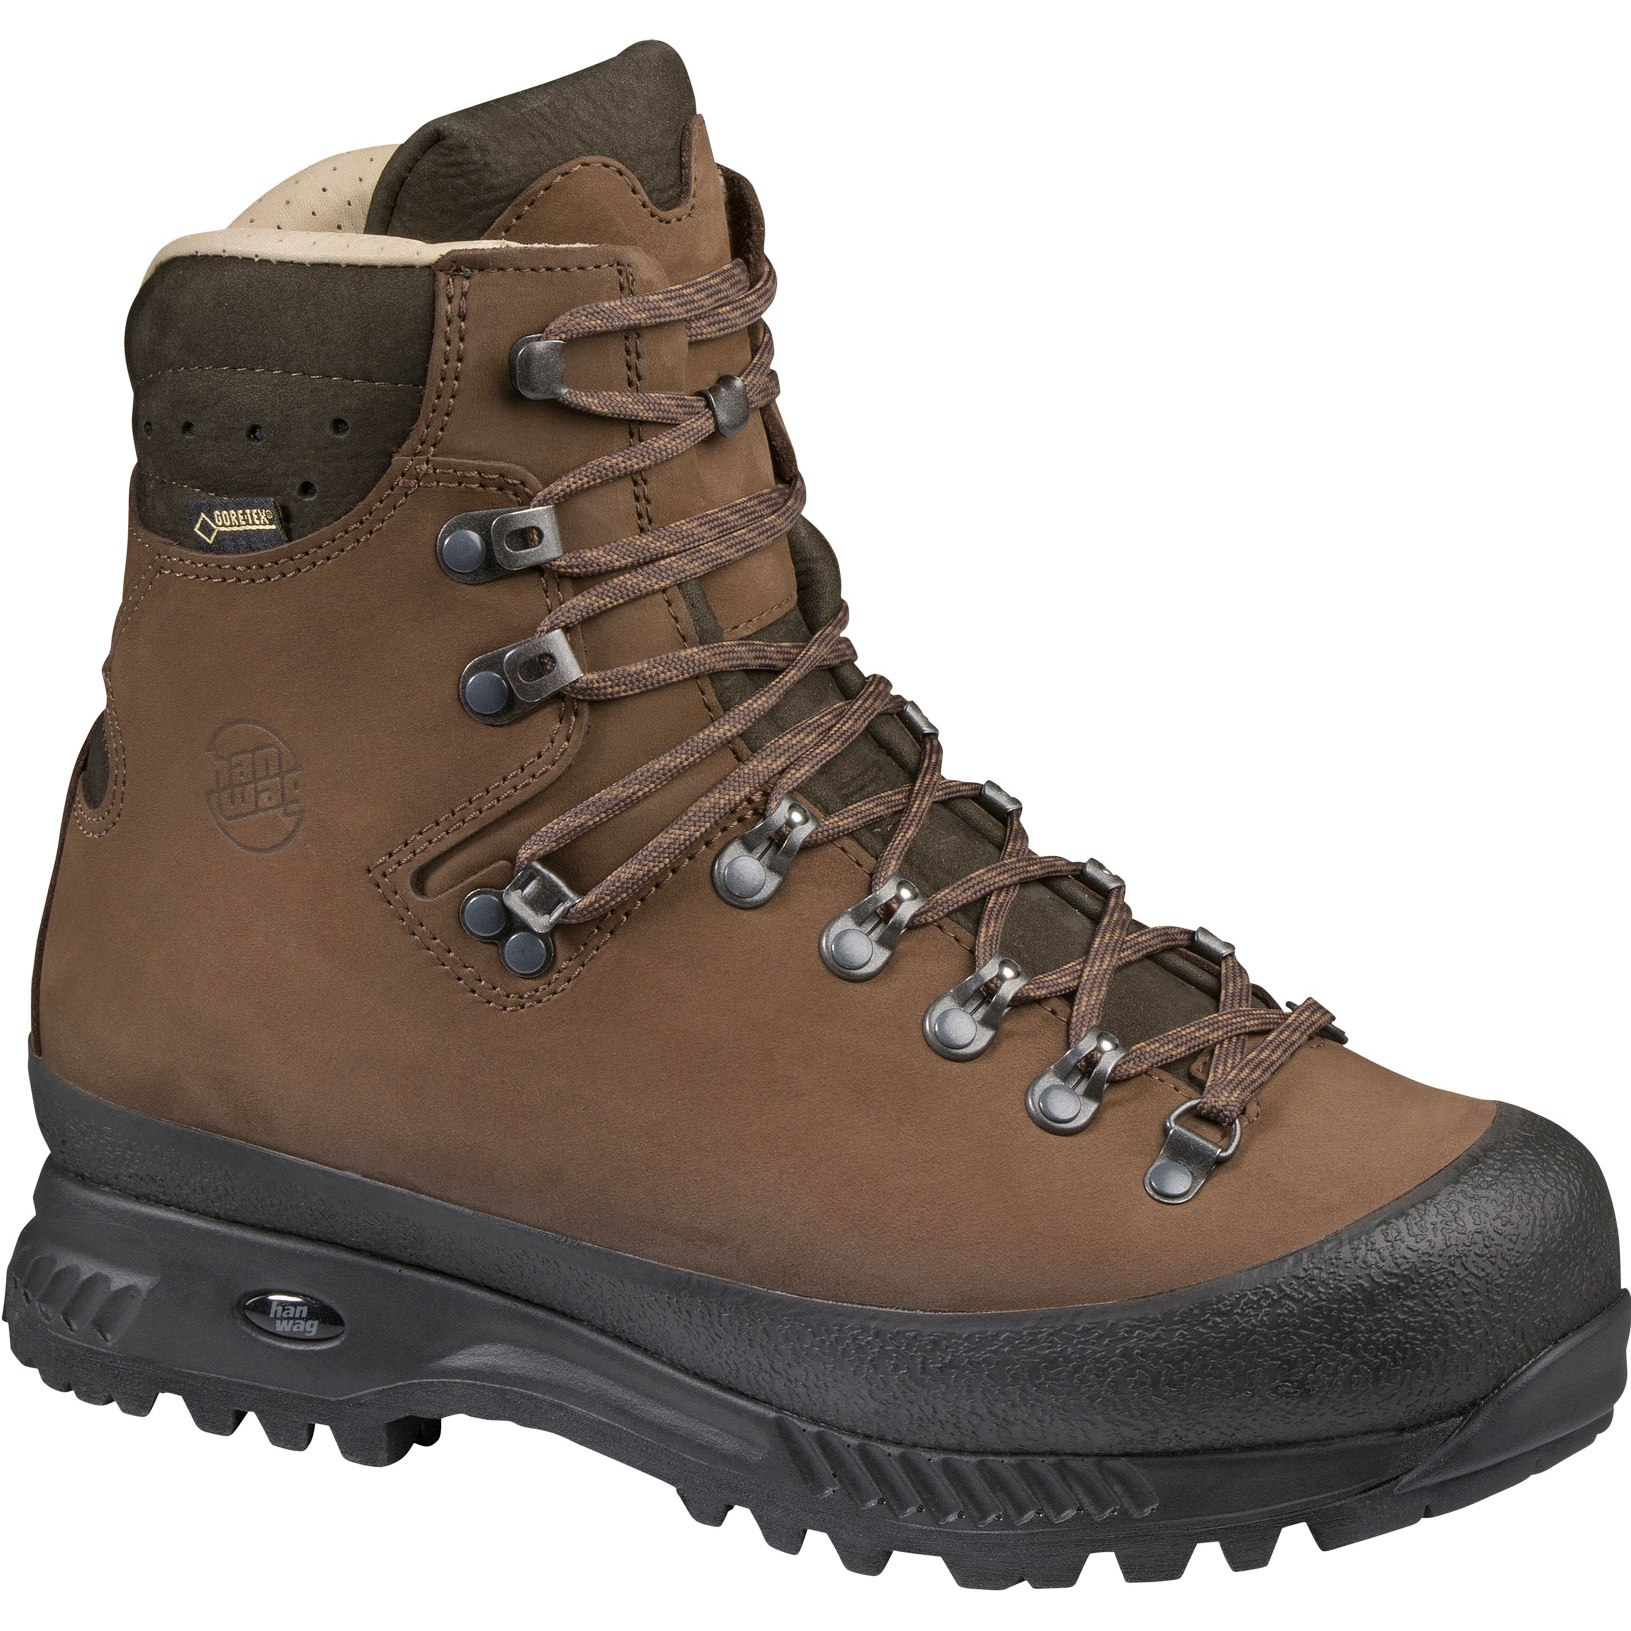 Hanwag Alaska Wide GTX Shoe - Brown